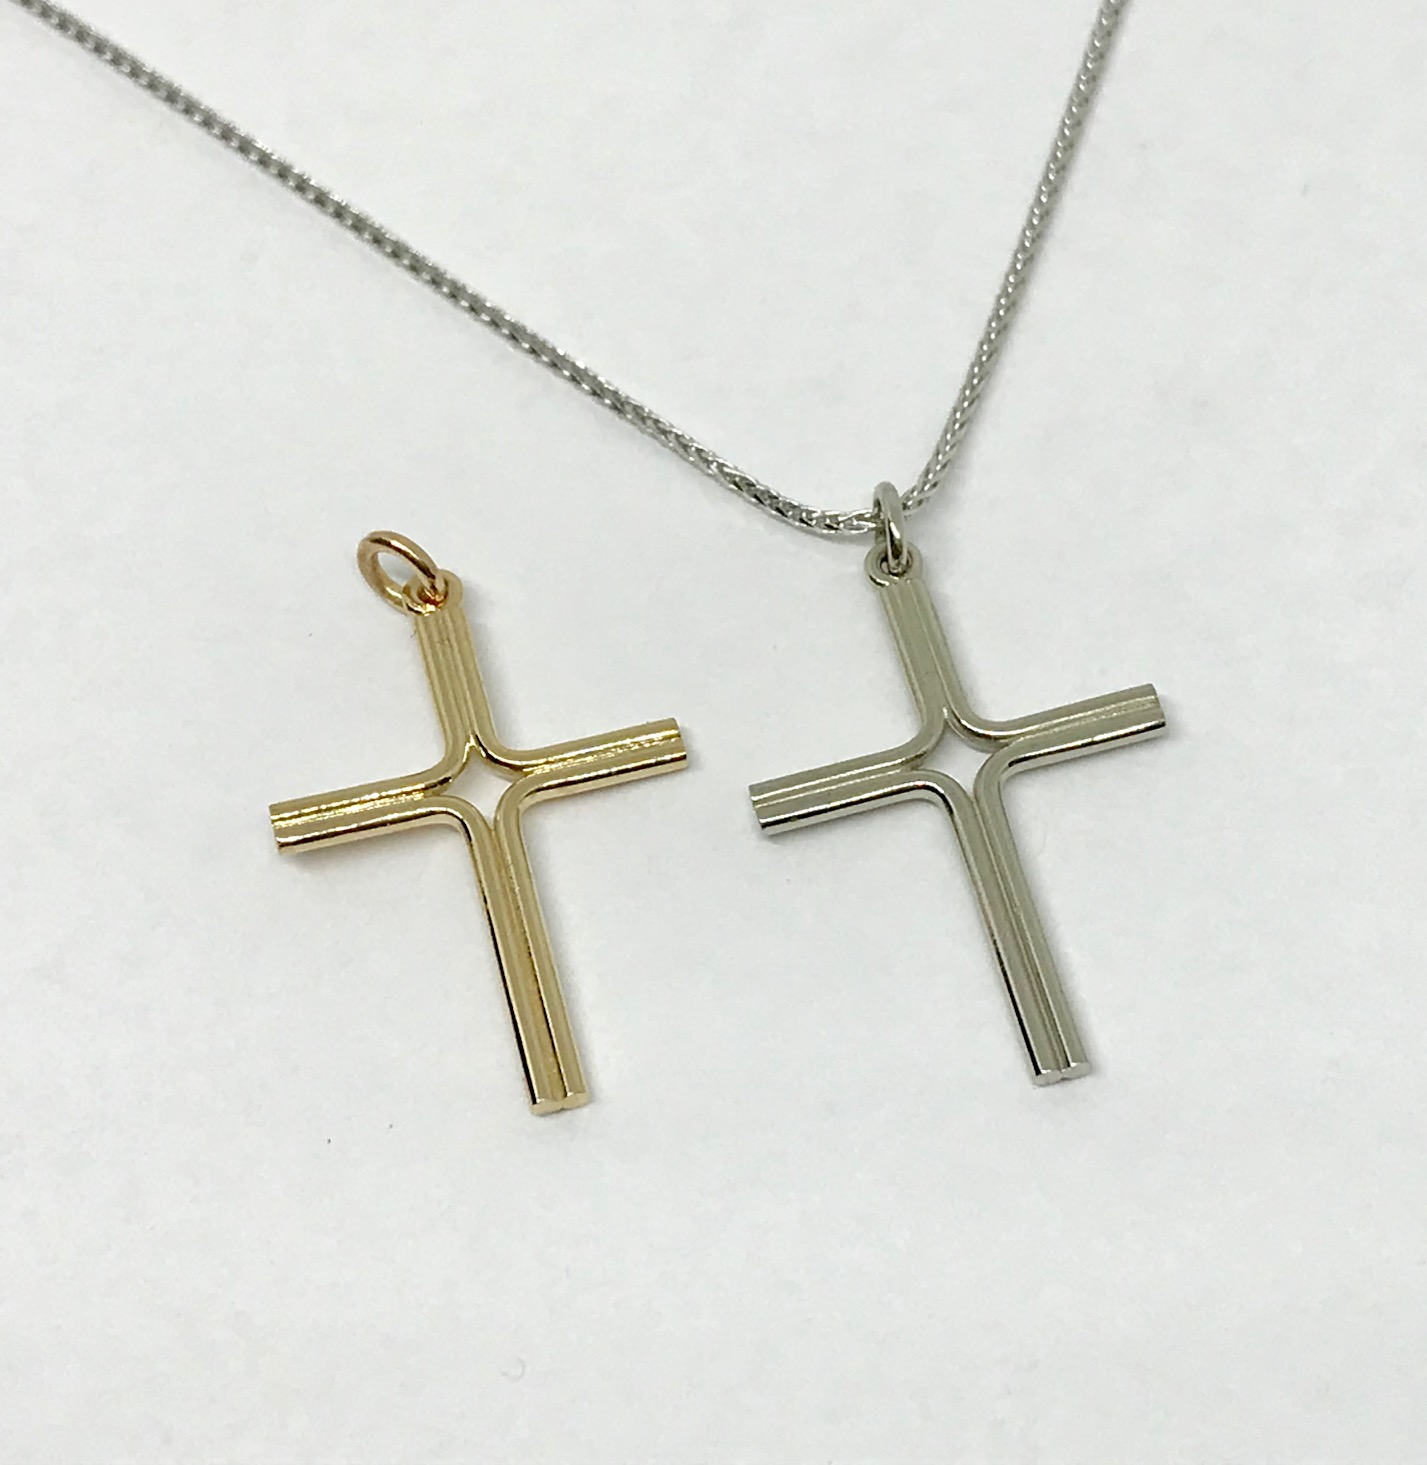 <b>Gold Crosses</b><br>$397ea.<br>14K Yellow or White Gold<br>Designer Series